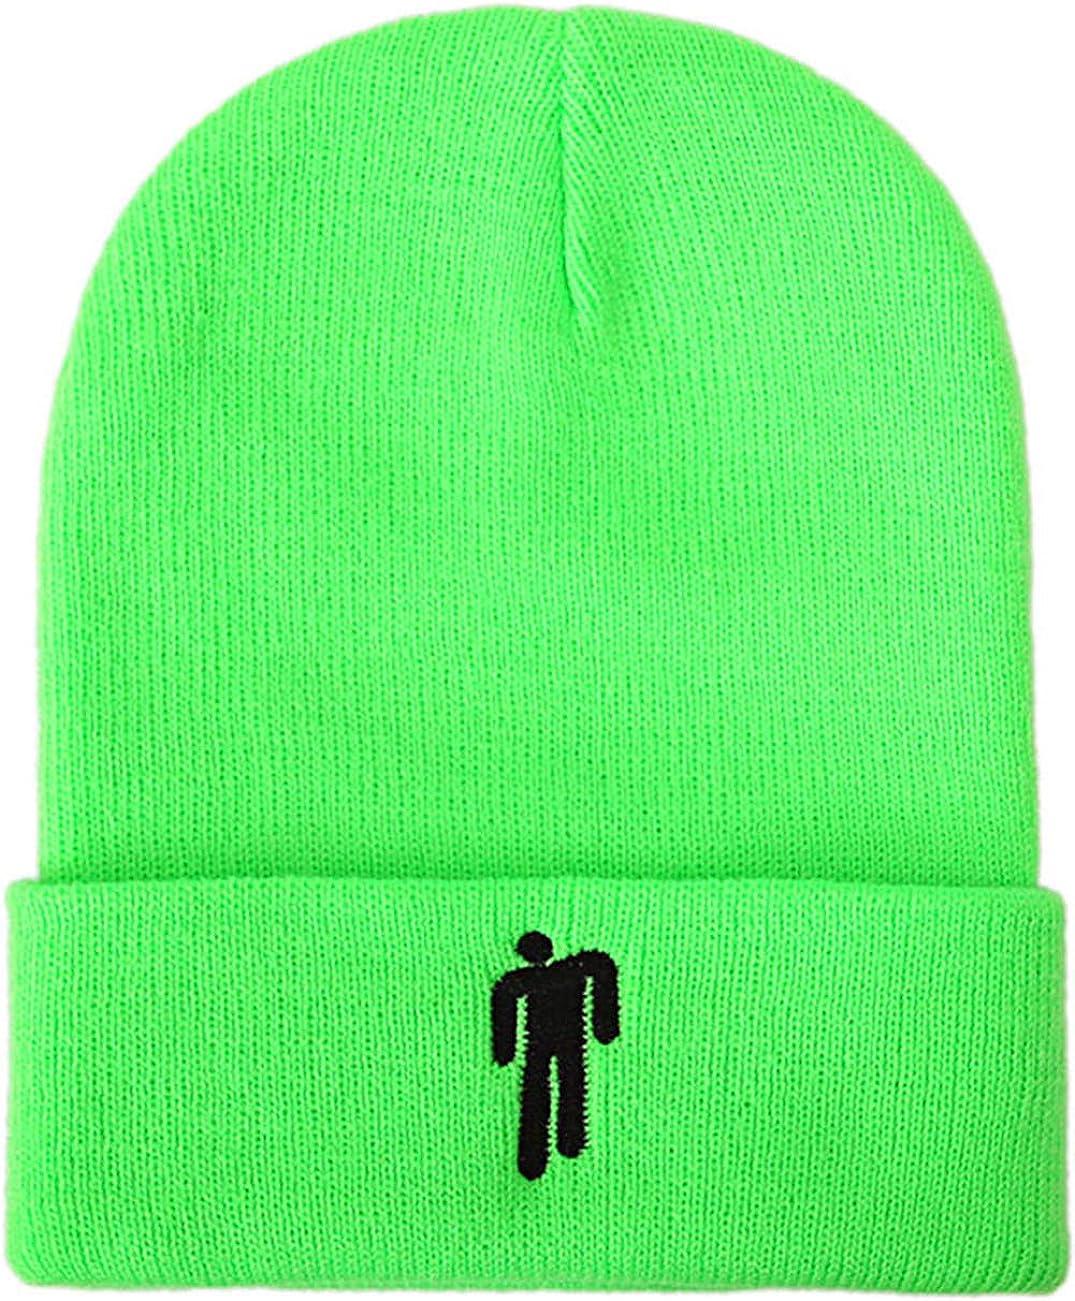 Tinyones Billie Eilish Hat Beanies Knit Hats Unisex Hot Topic Logo Stretchy Cap